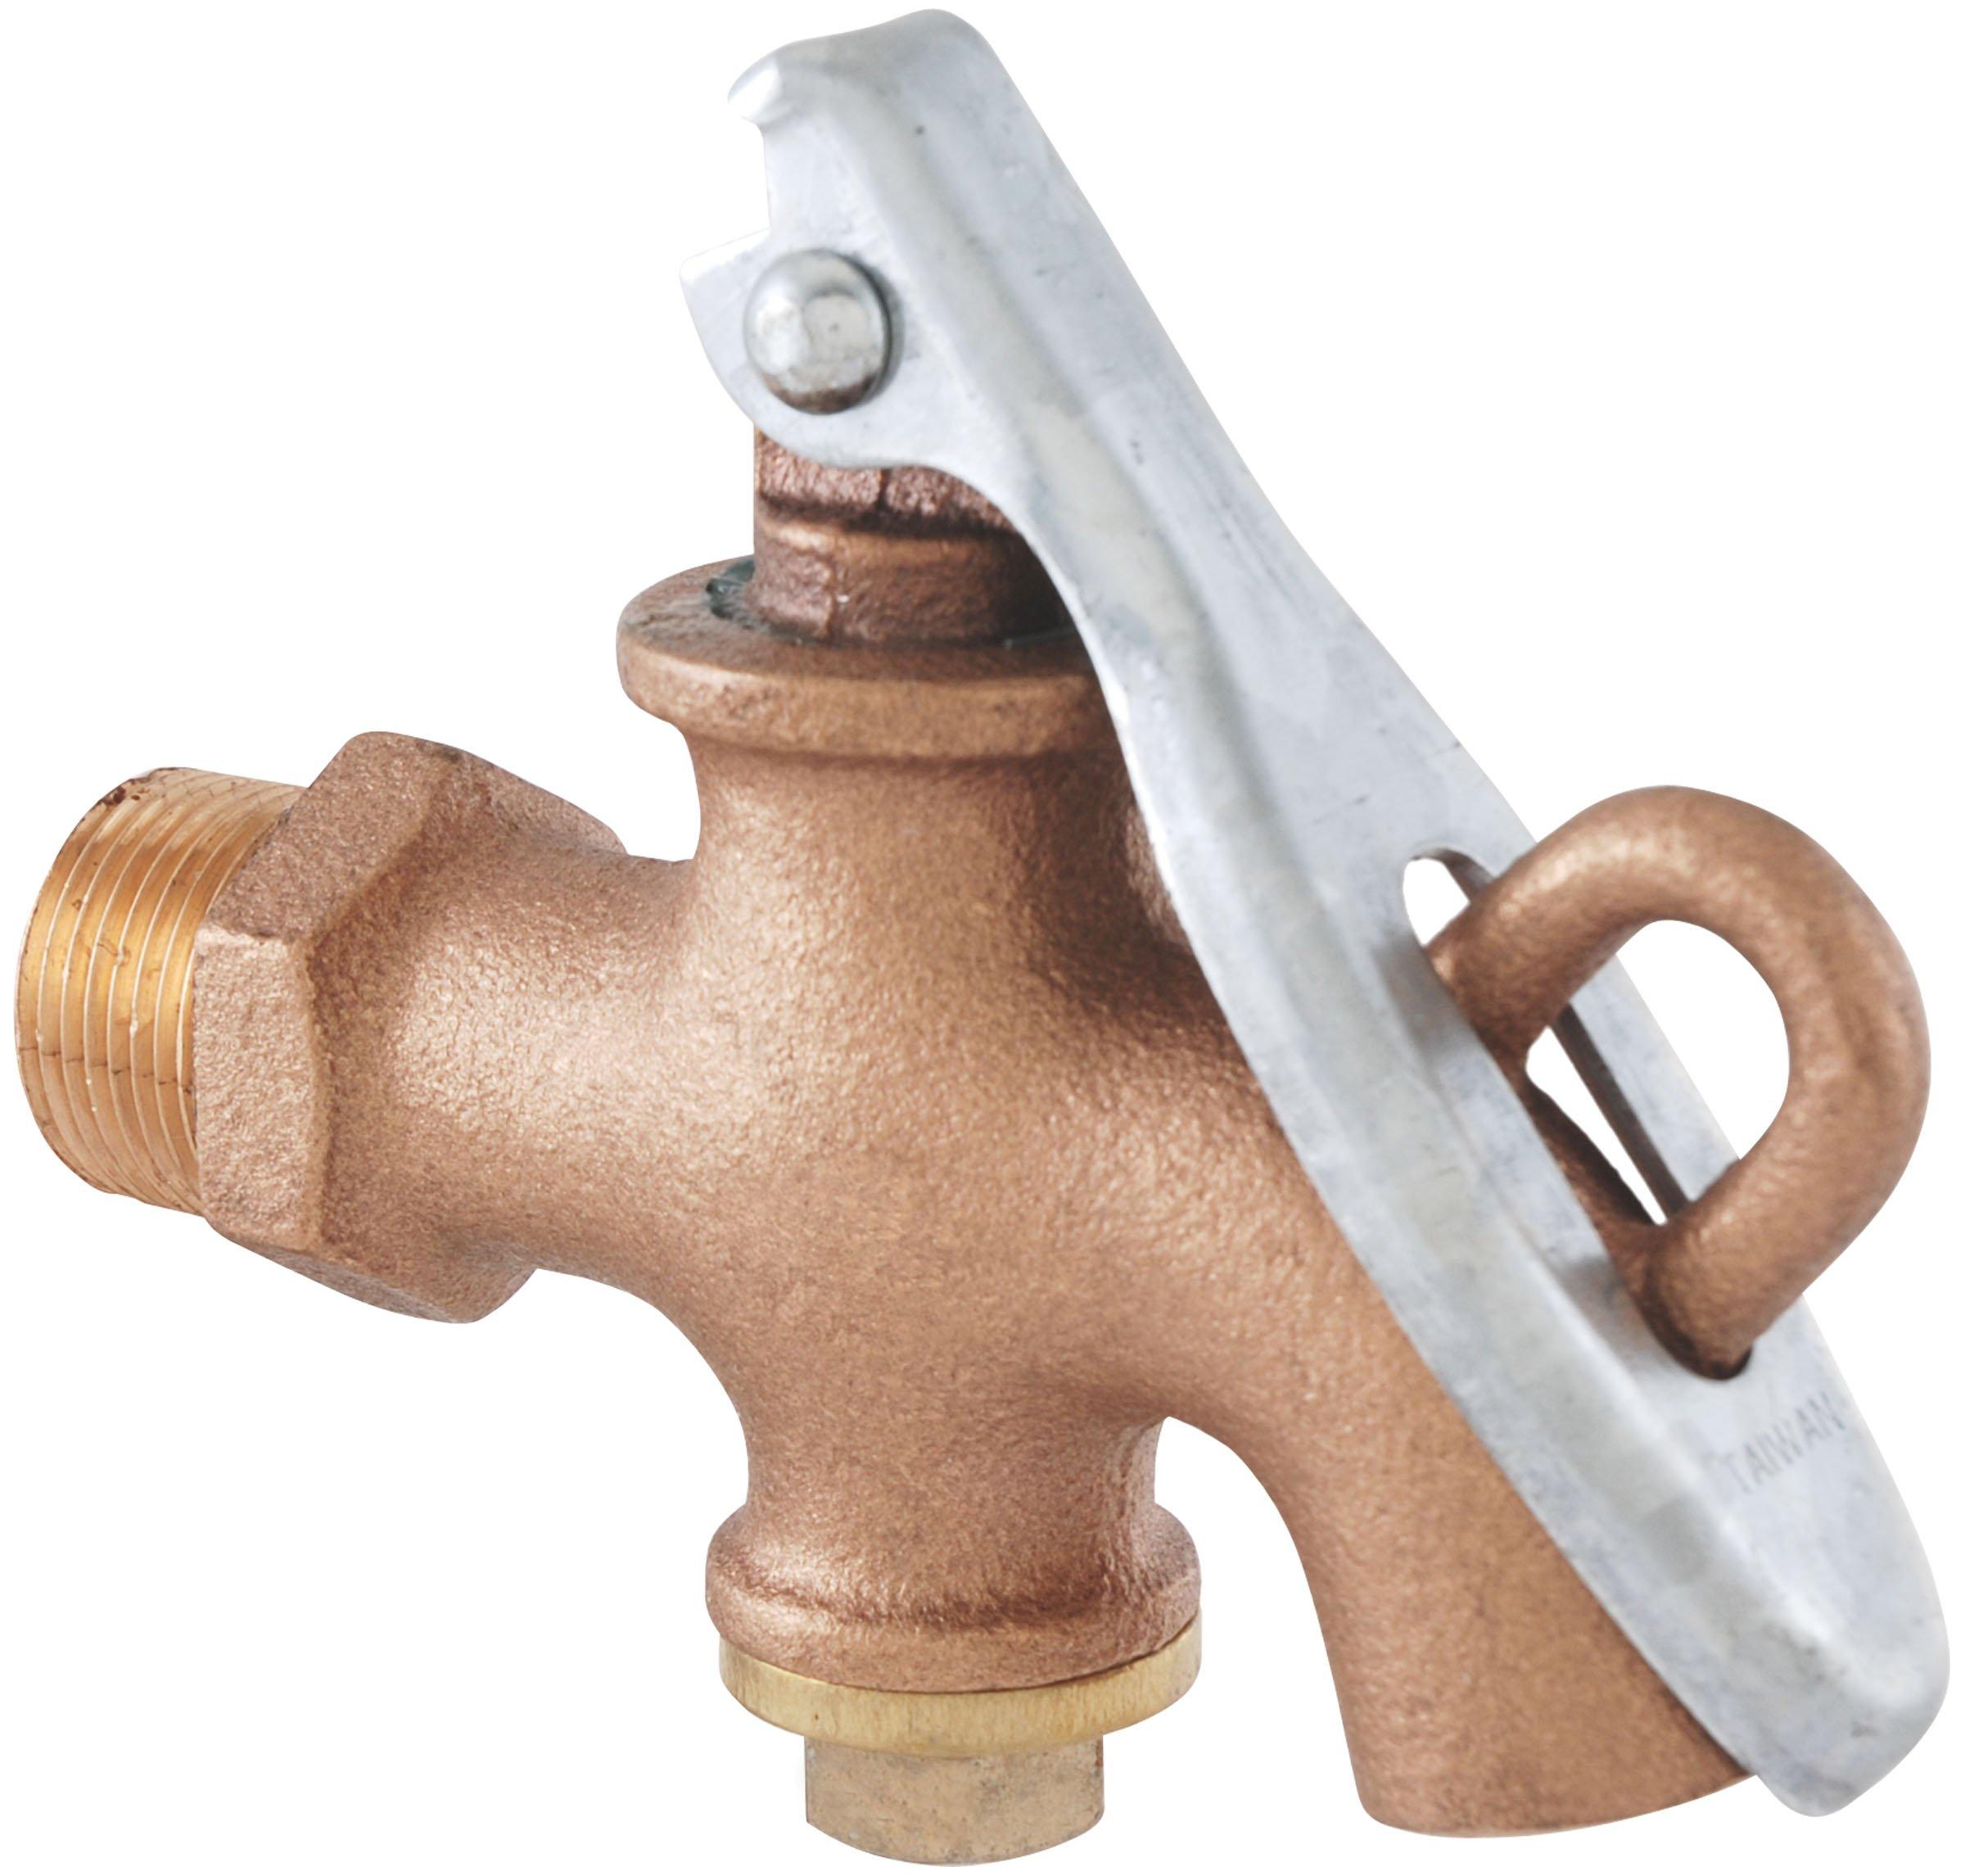 LDR 020 9904 3/4-Inch Barrel Drum Lockable Faucet, Bronze